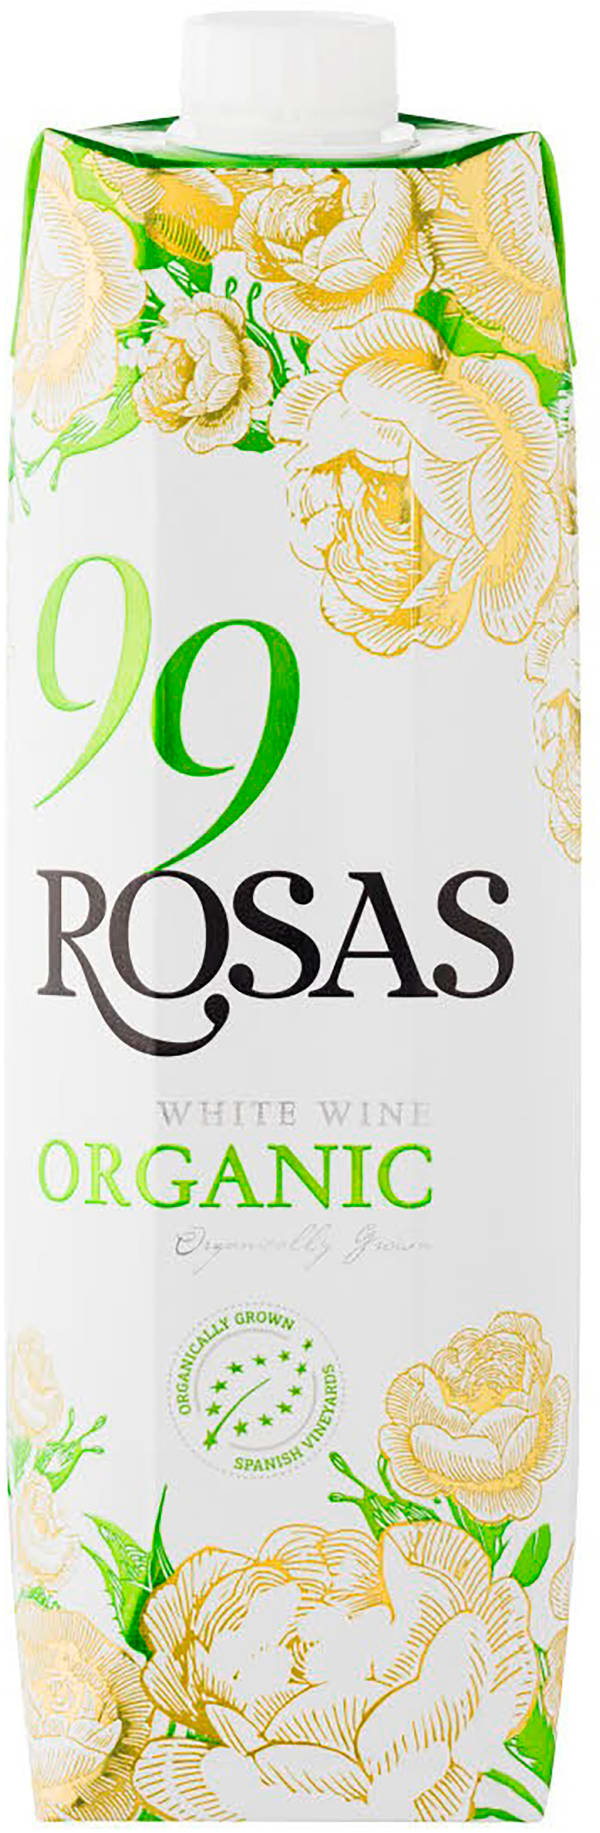 99 Rosas Organic White Wine 2018 carton package